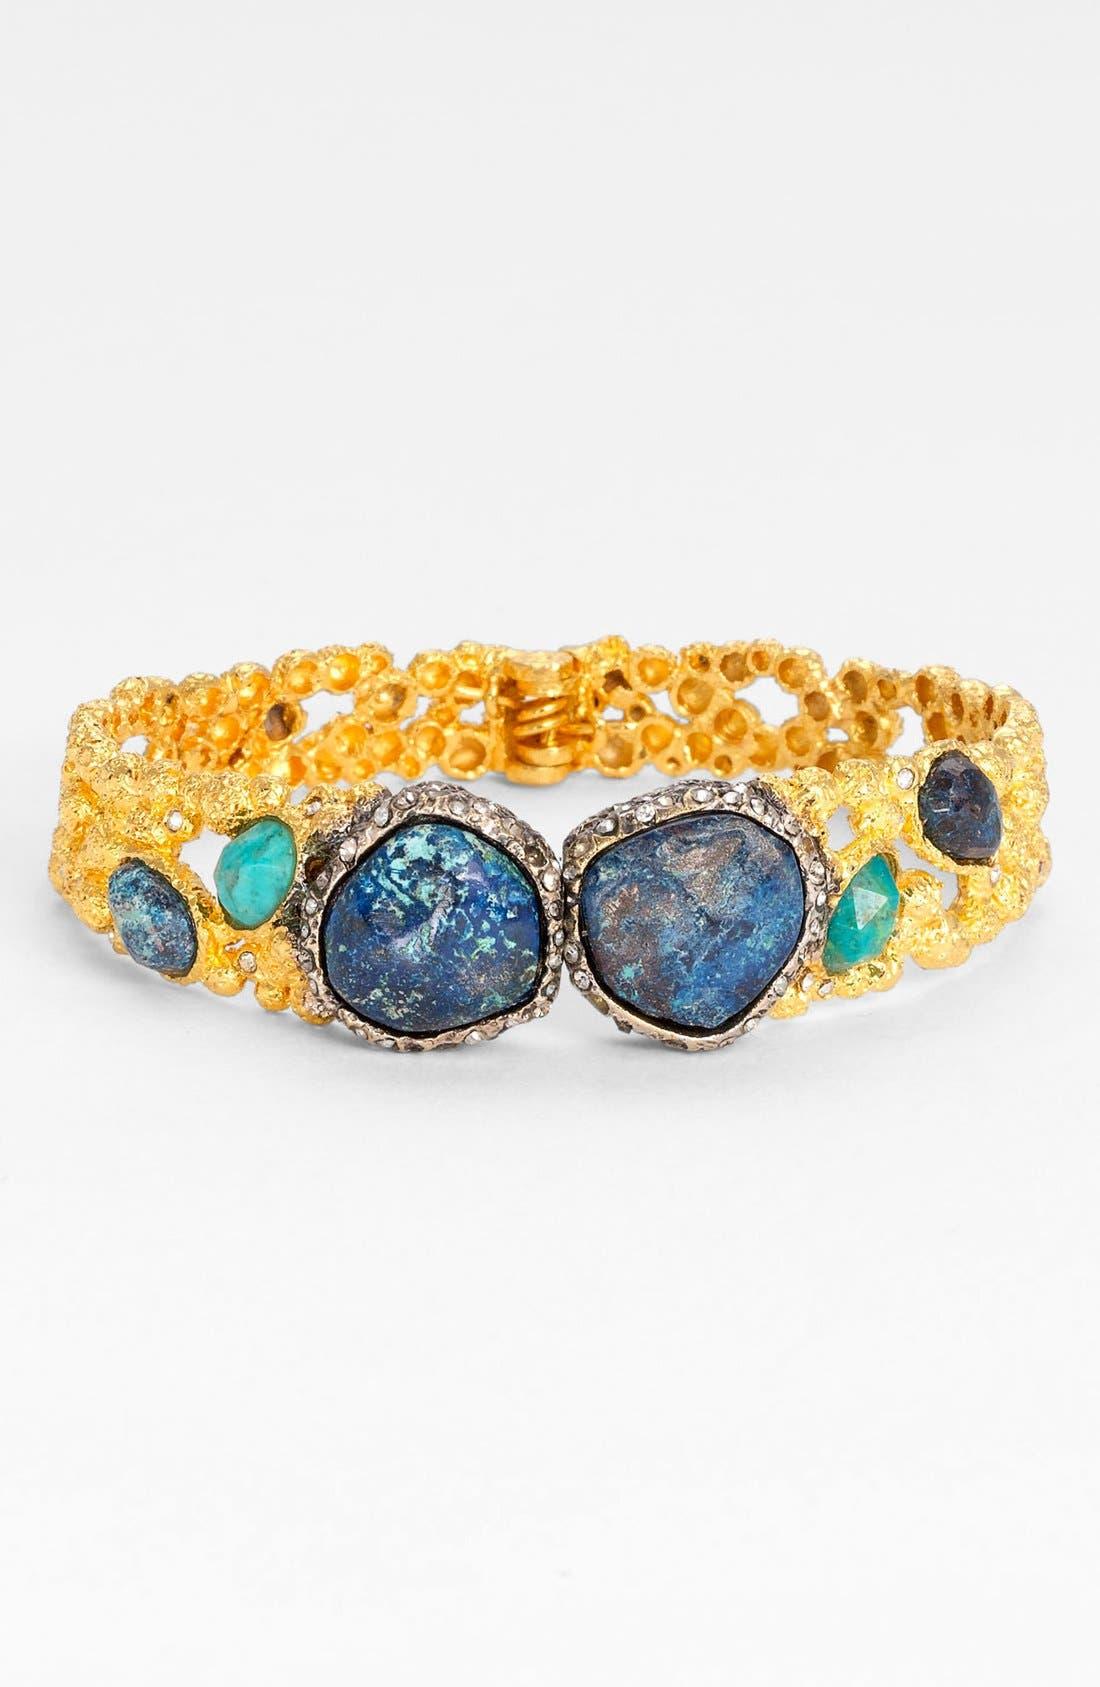 Main Image - Alexis Bittar 'Elements - Cordova' Chrysocolla Encrusted Hinged Bracelet